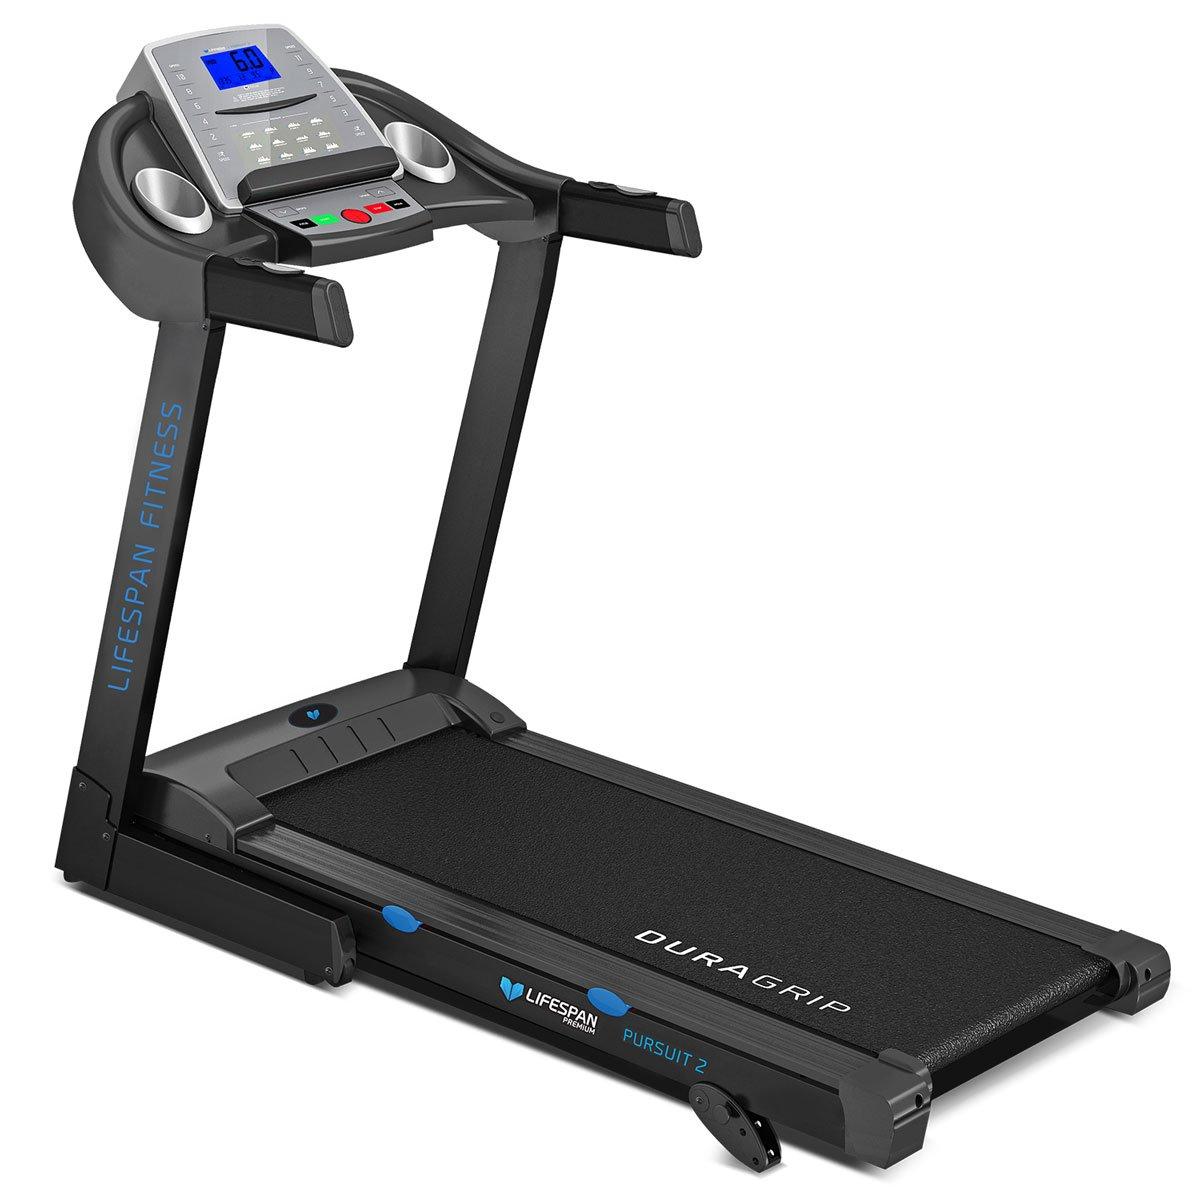 Lifespan Fitness Pursuit Treadmill – 2HP Motor